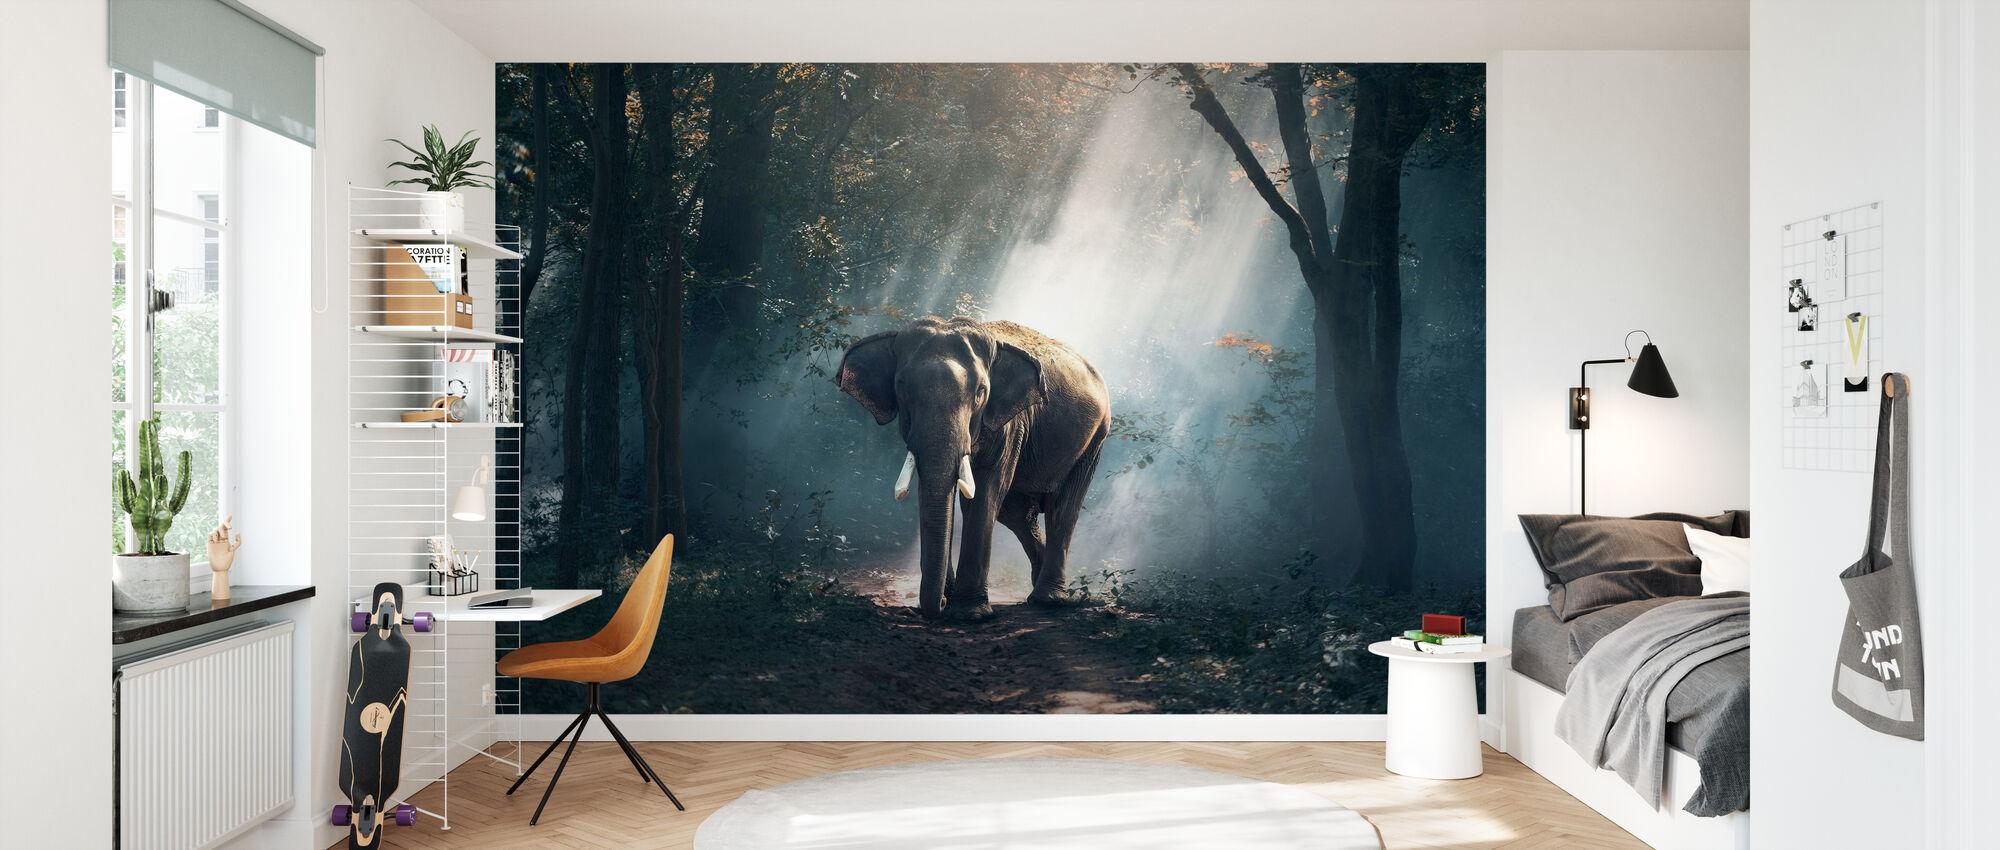 Olifant in het bos - Behang - Kinderkamer